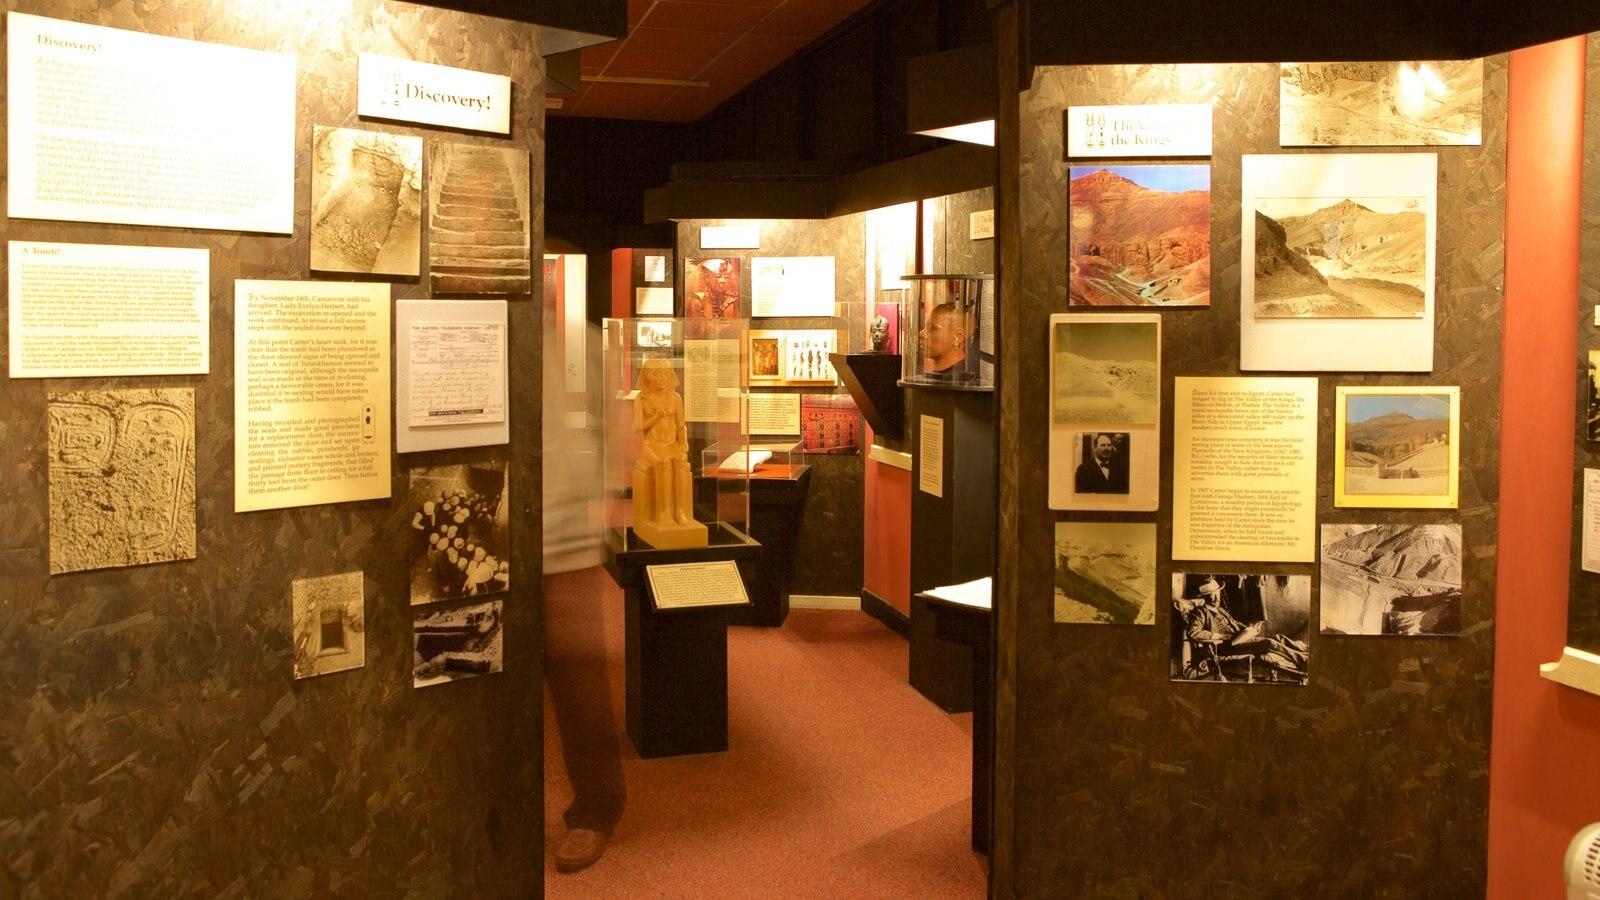 Tutankamon a exposição mostrando vistas internas